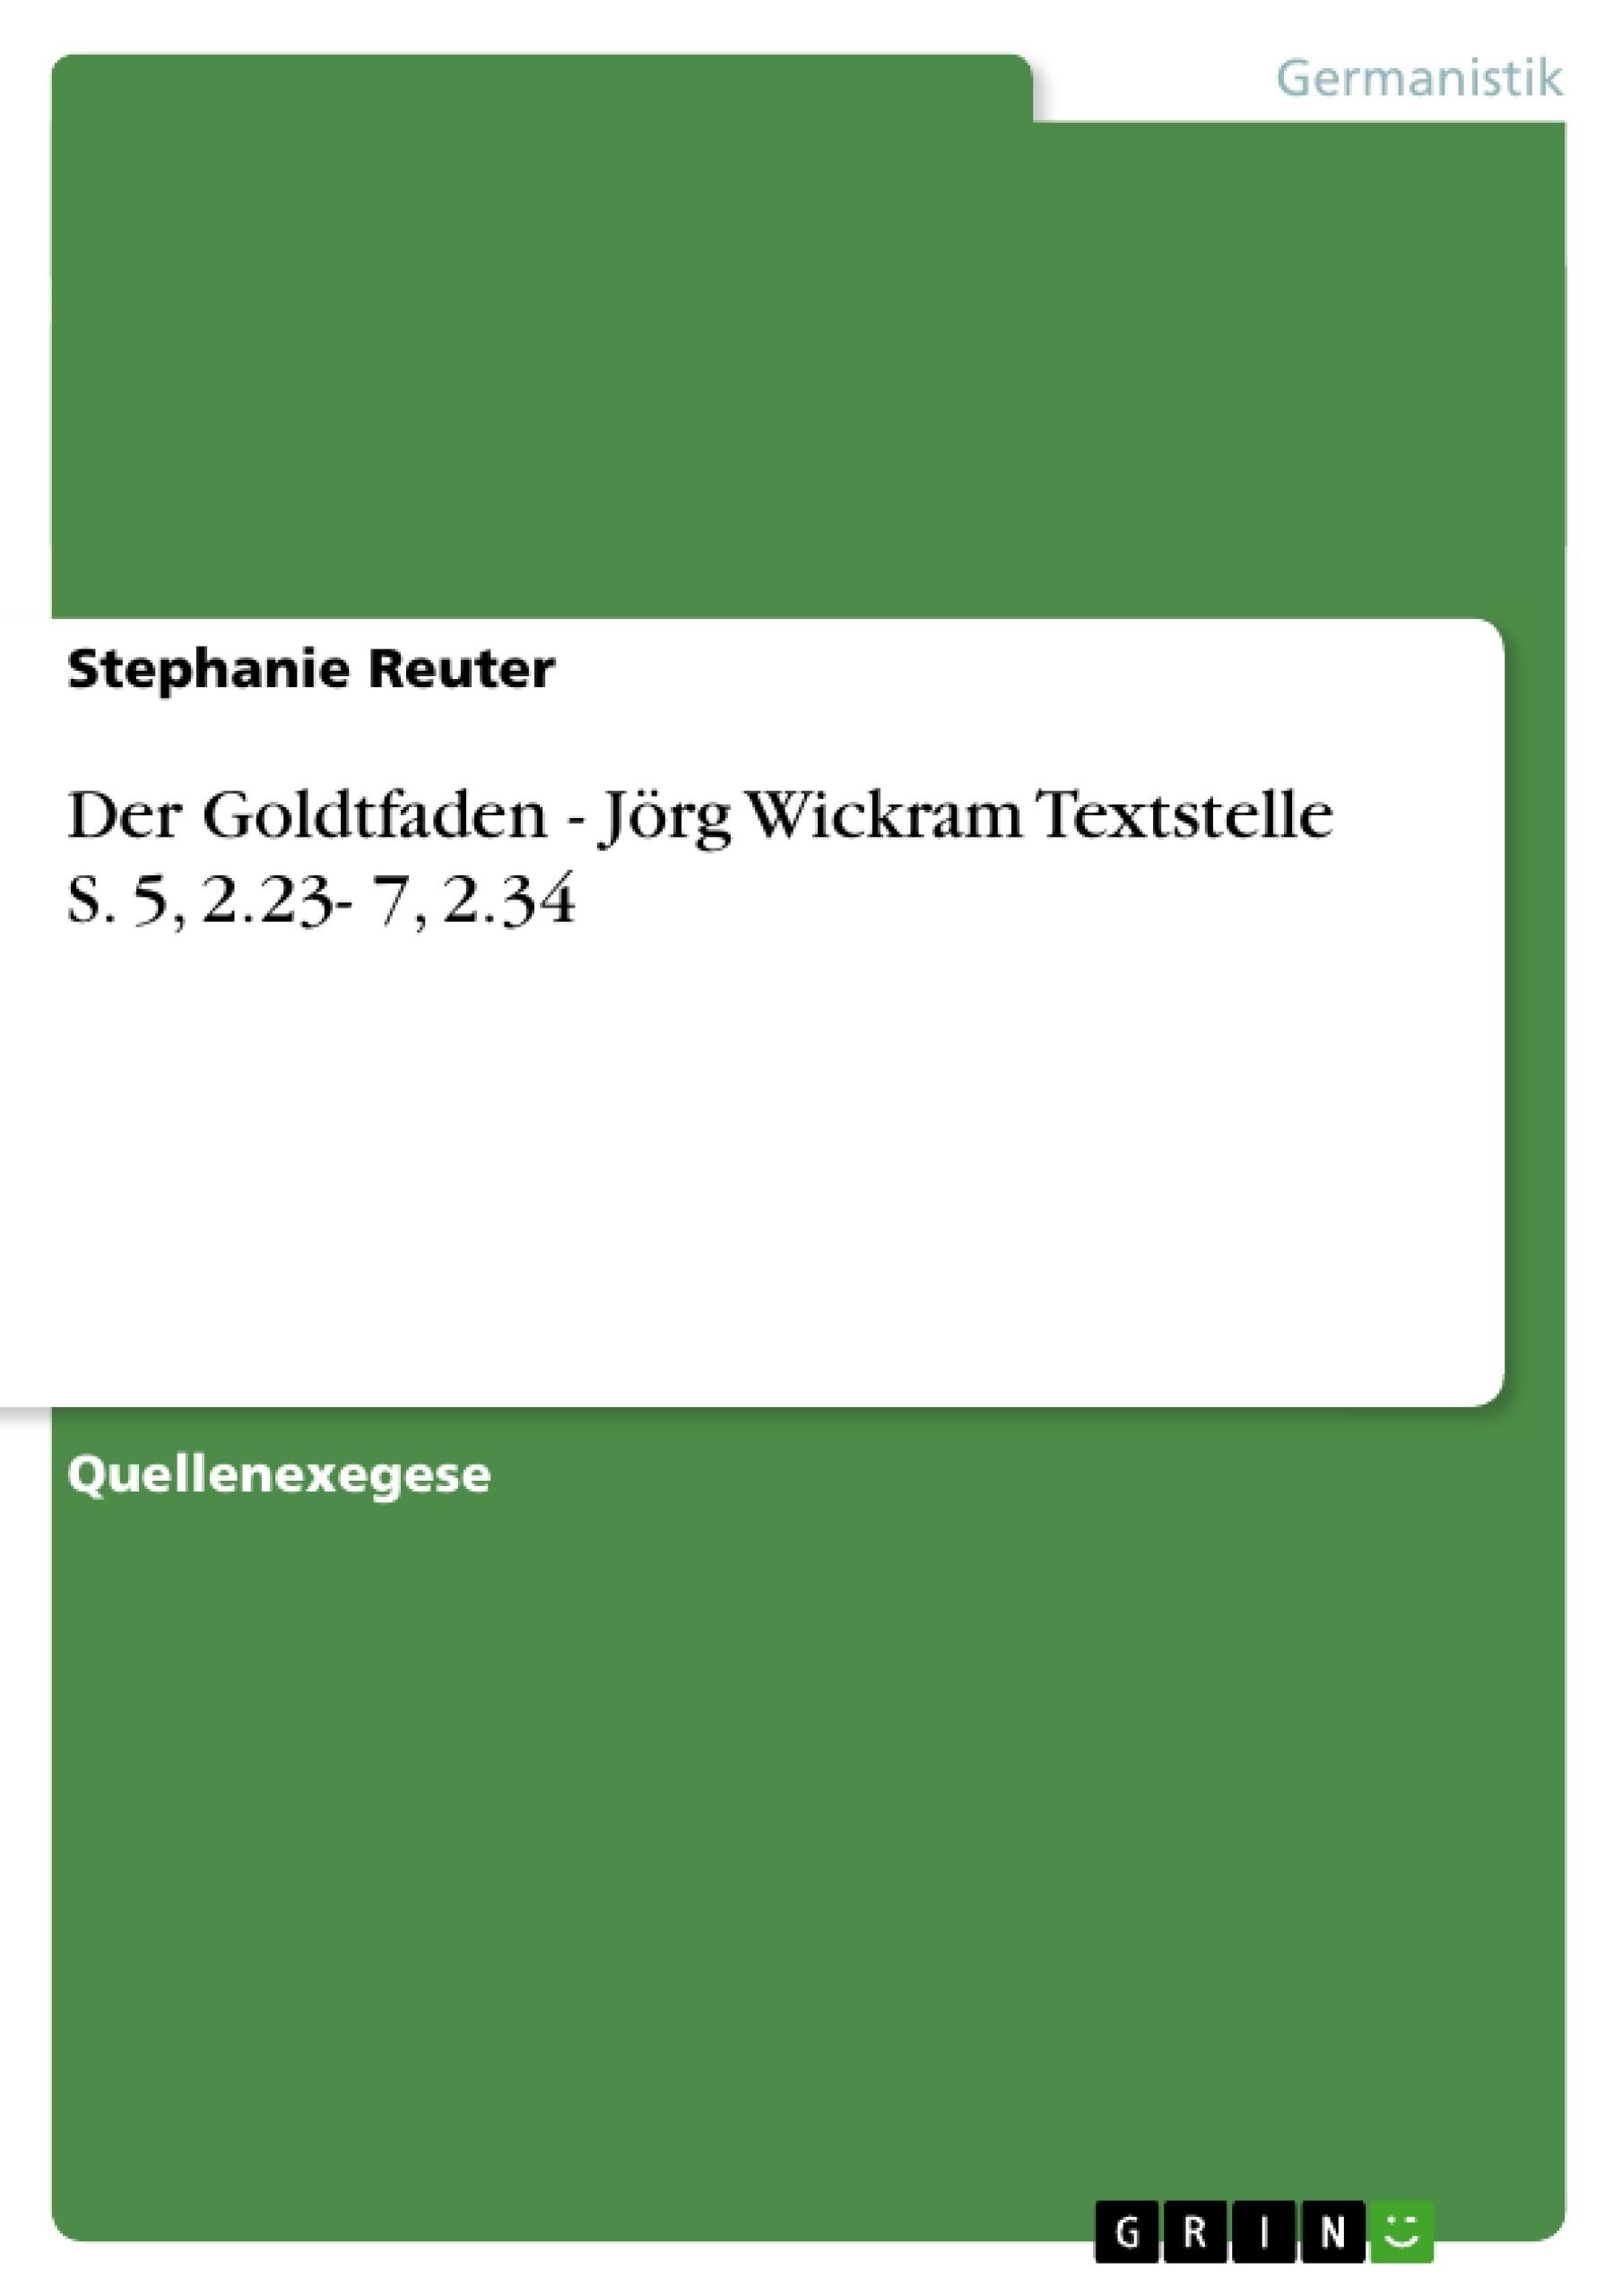 Titel: Der Goldtfaden - Jörg Wickram Textstelle S. 5, 2.23- 7, 2.34